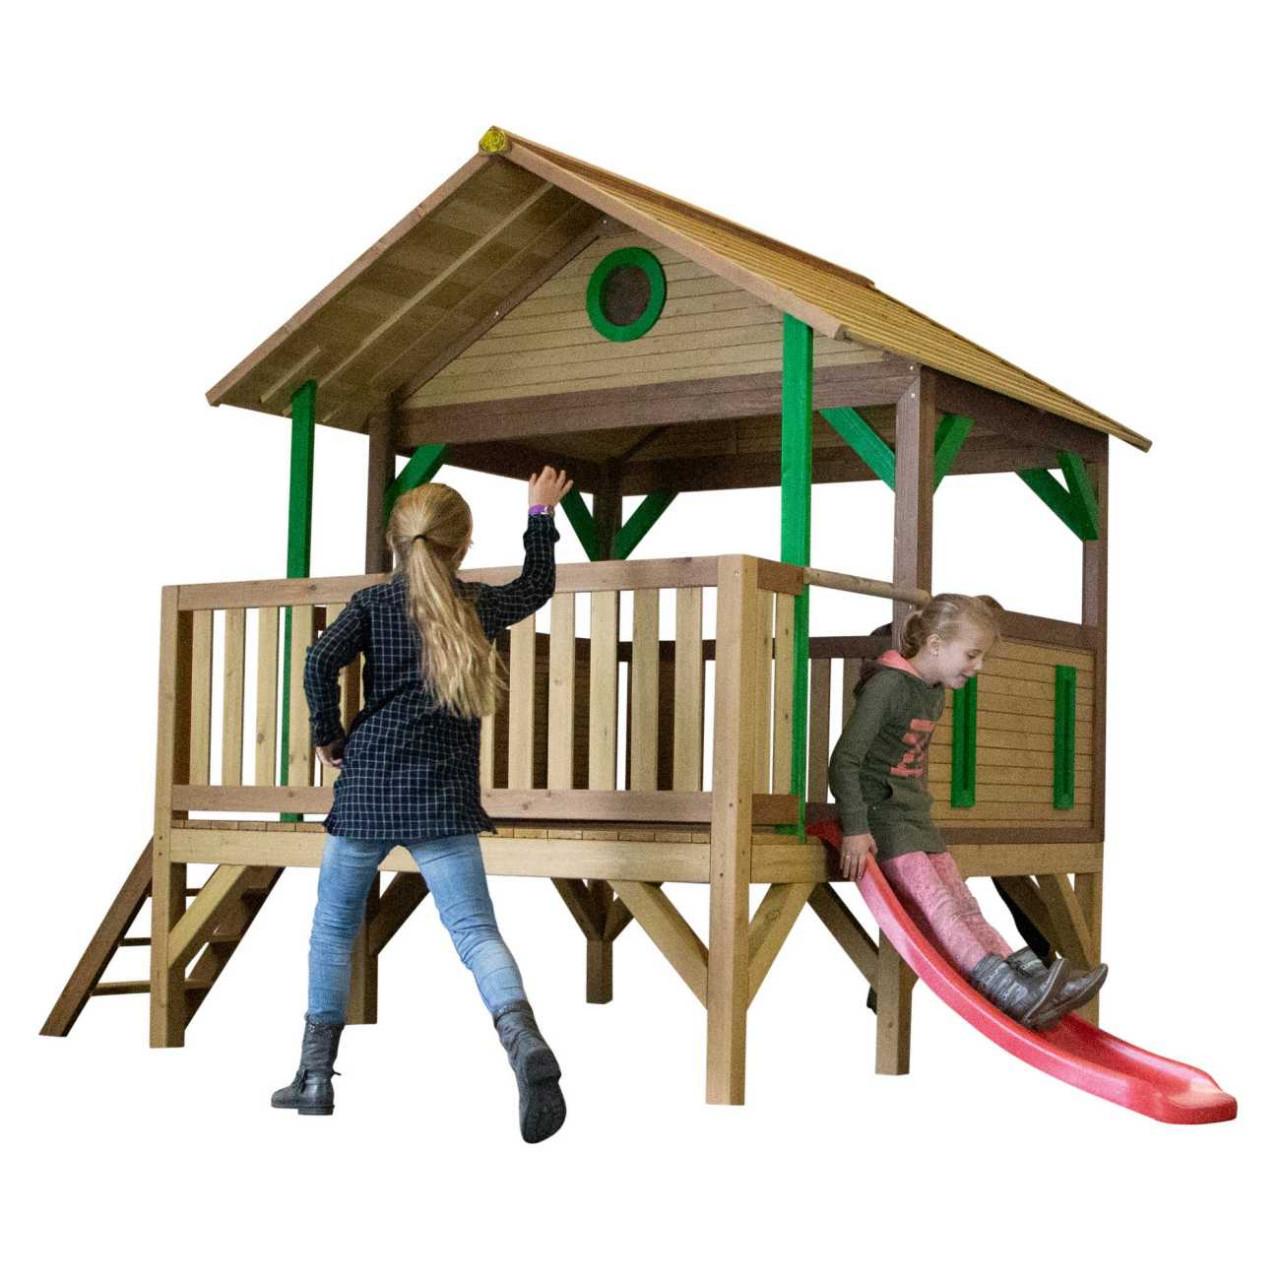 Spielturm Meeko, Axi Spielturm, Spielhaus, Kinder